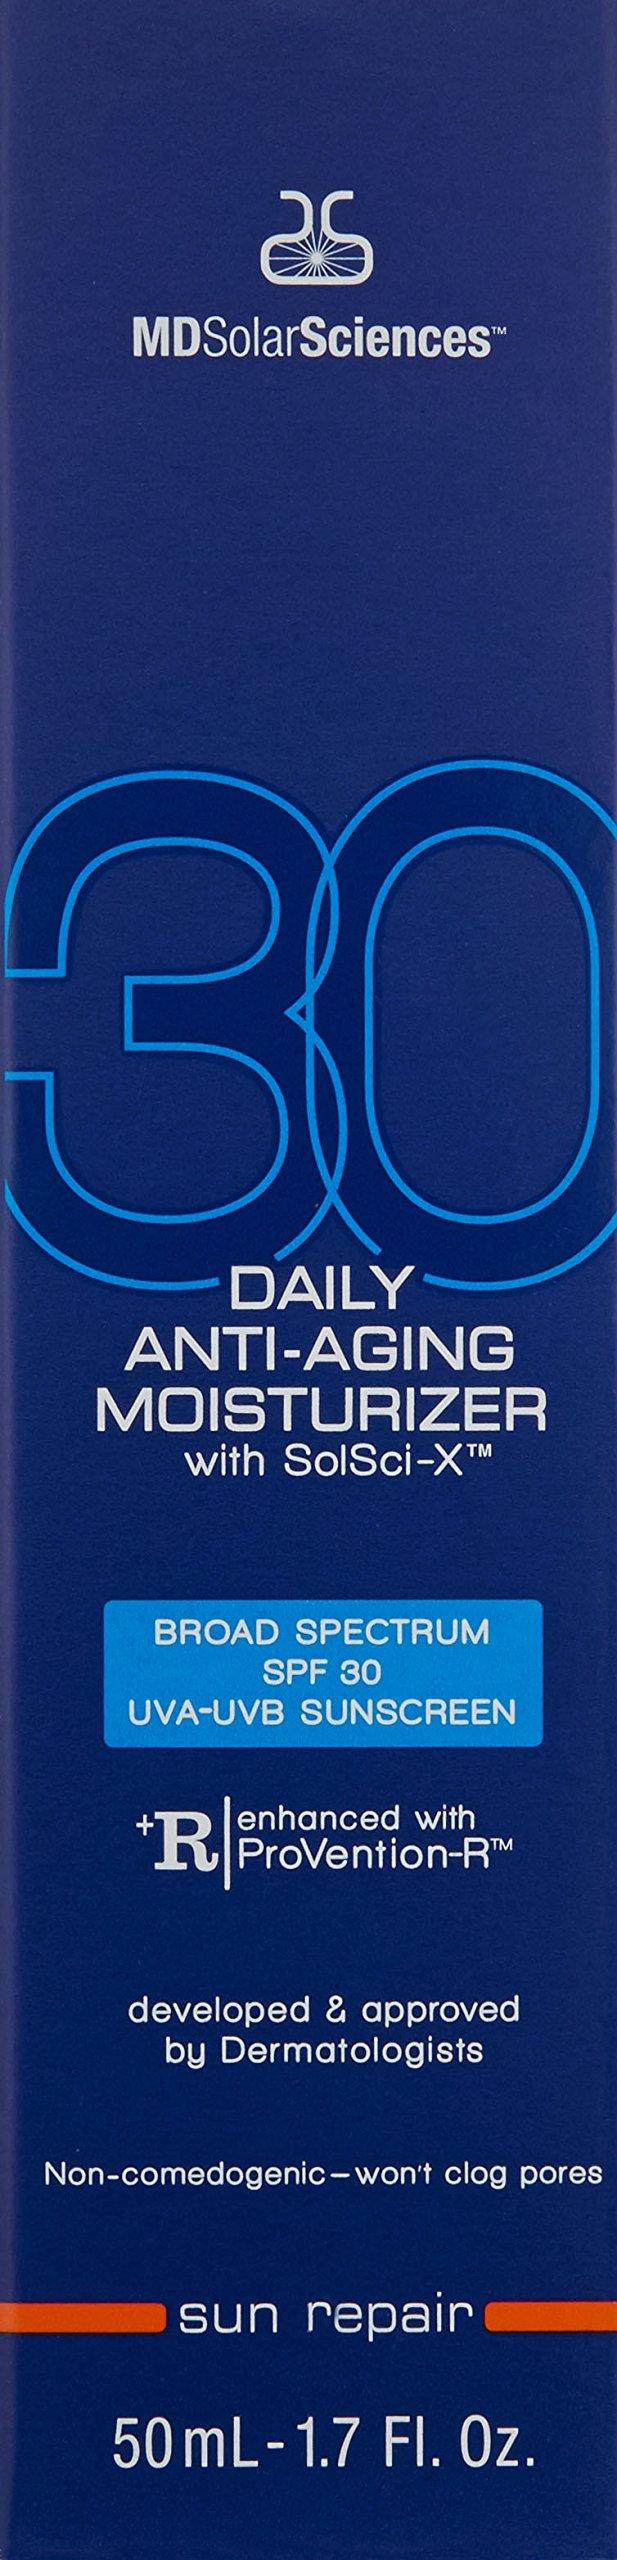 MDSolarSciences Daily Anti-Aging Broad Spectrum SPF 30 Moisturizer, 1.7 fl.oz. by MDSolarSciences (Image #3)